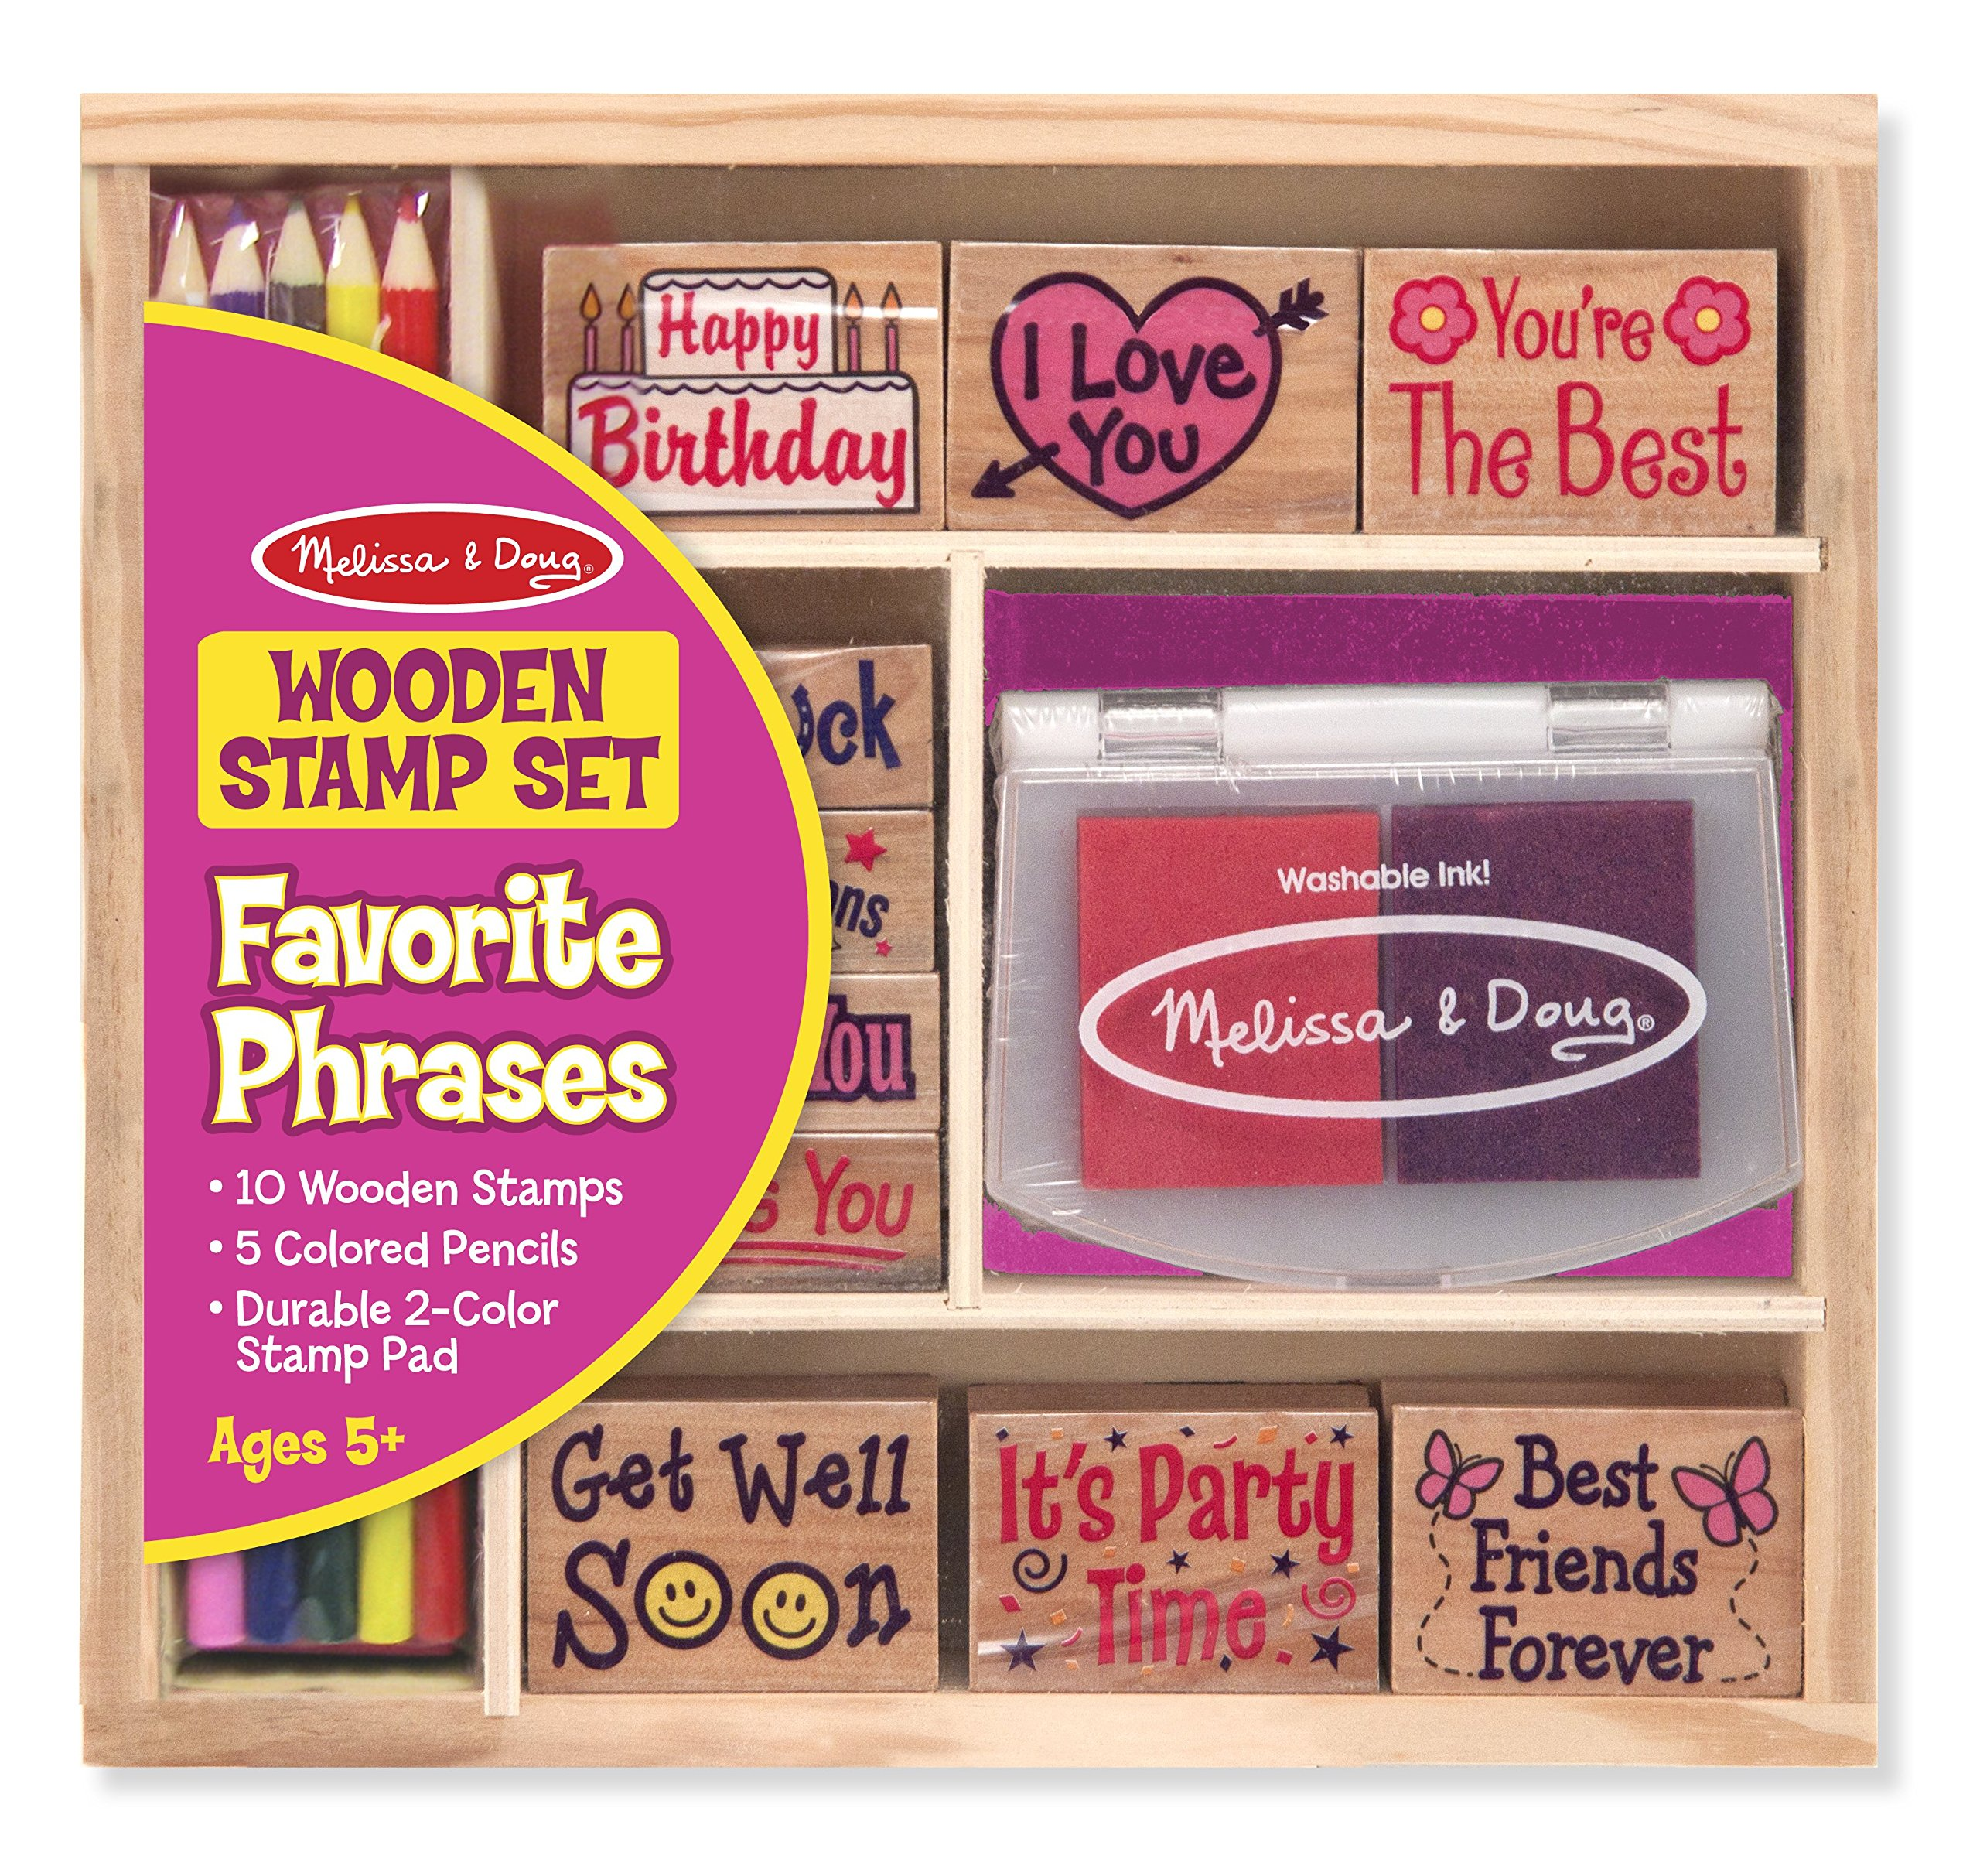 Melissa & Doug Favorite Phrases Wooden Stamp Set - 10 Stamps, 5 Colored Pencils, 2-Color Stamp Pad